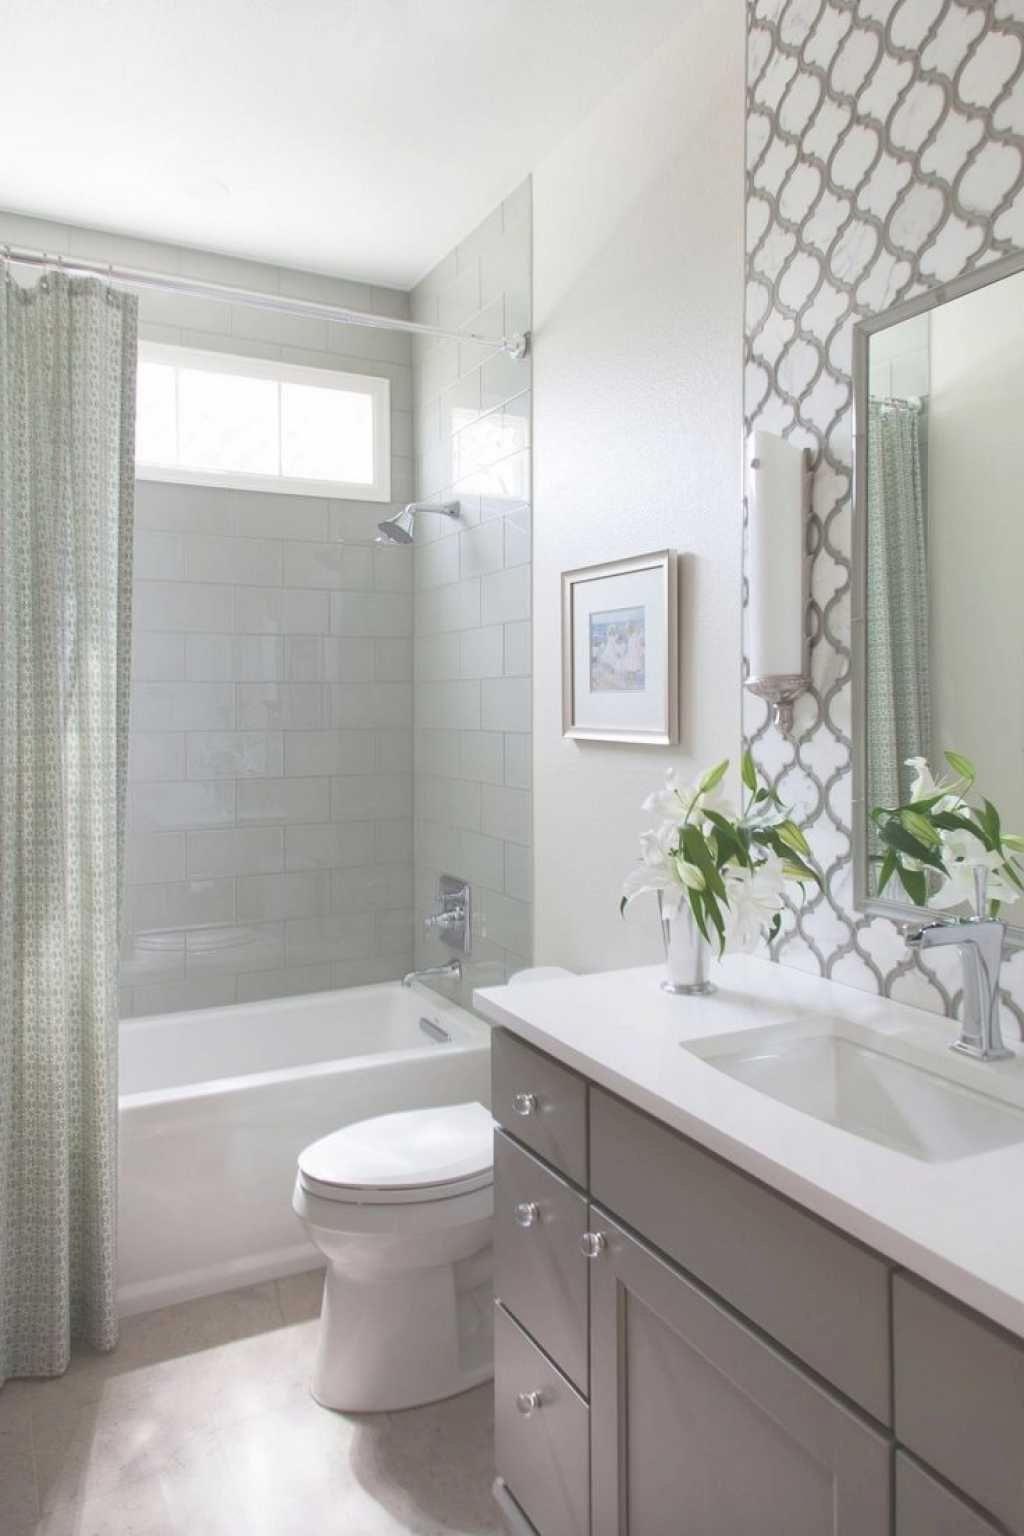 Nice 111 Brilliant Small Bathroom Remodel Ideas On A